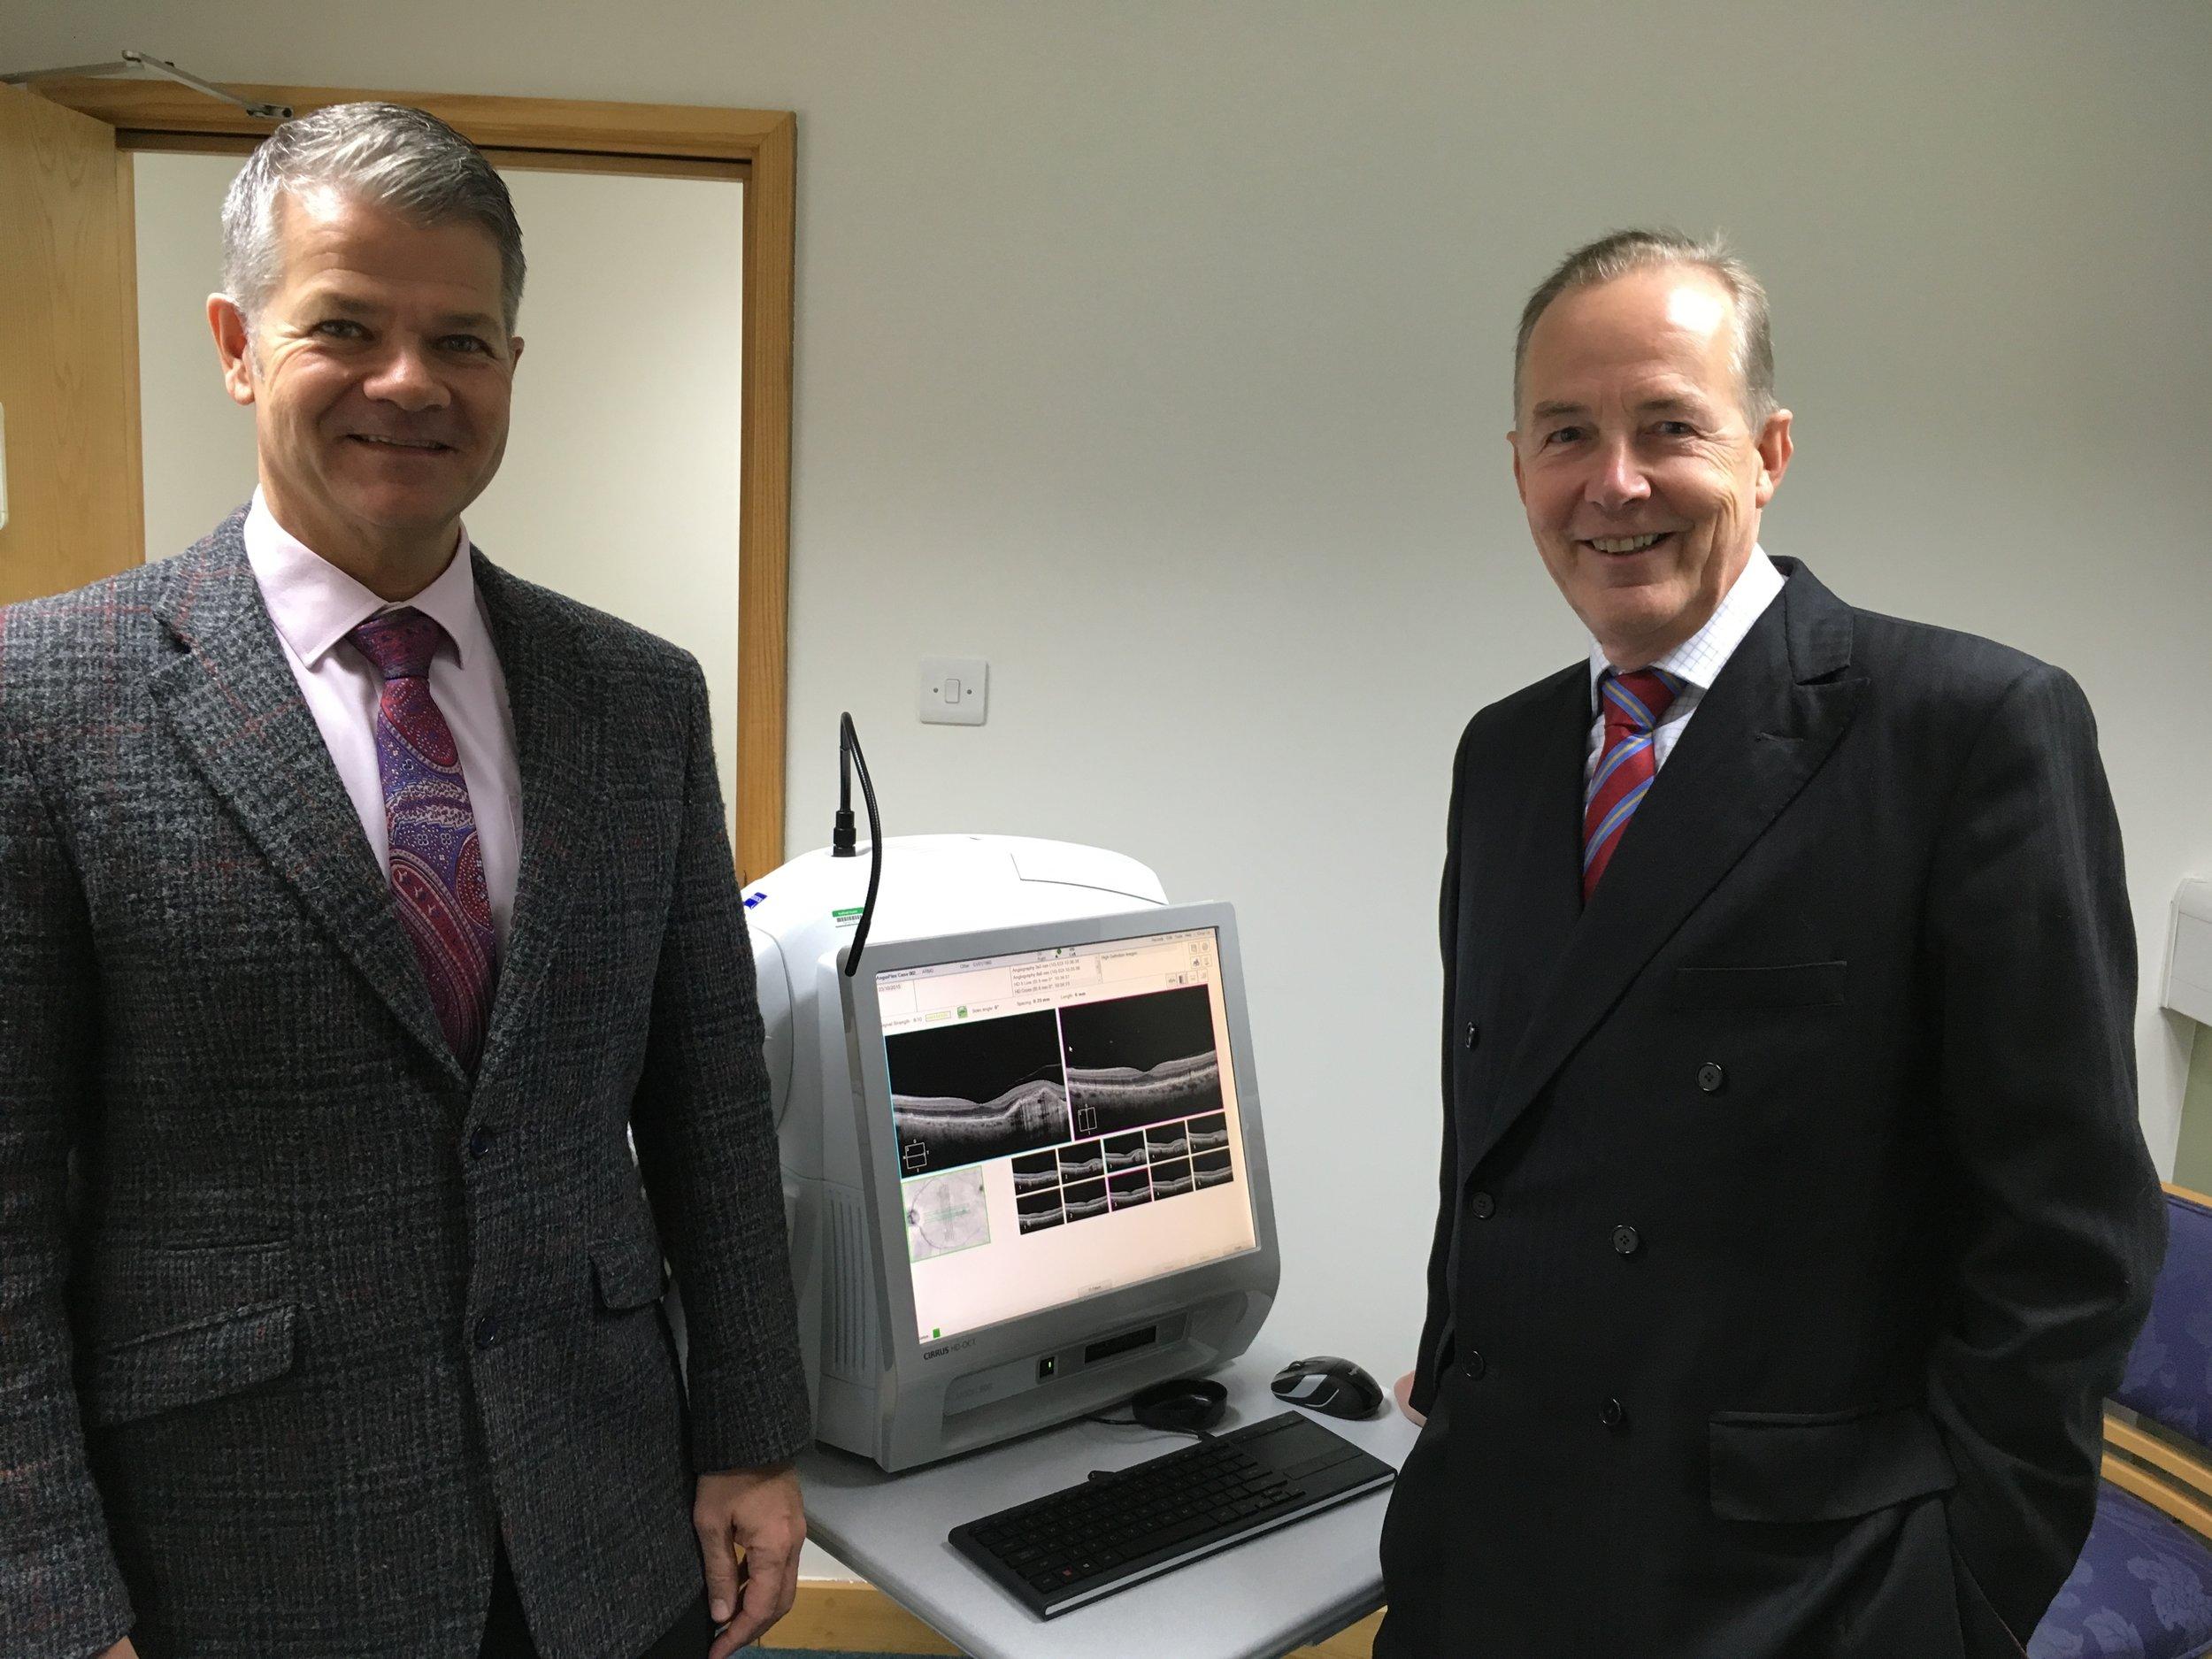 Ian Milne and Simon Hardman-Lea new OCT machine 2.jpeg